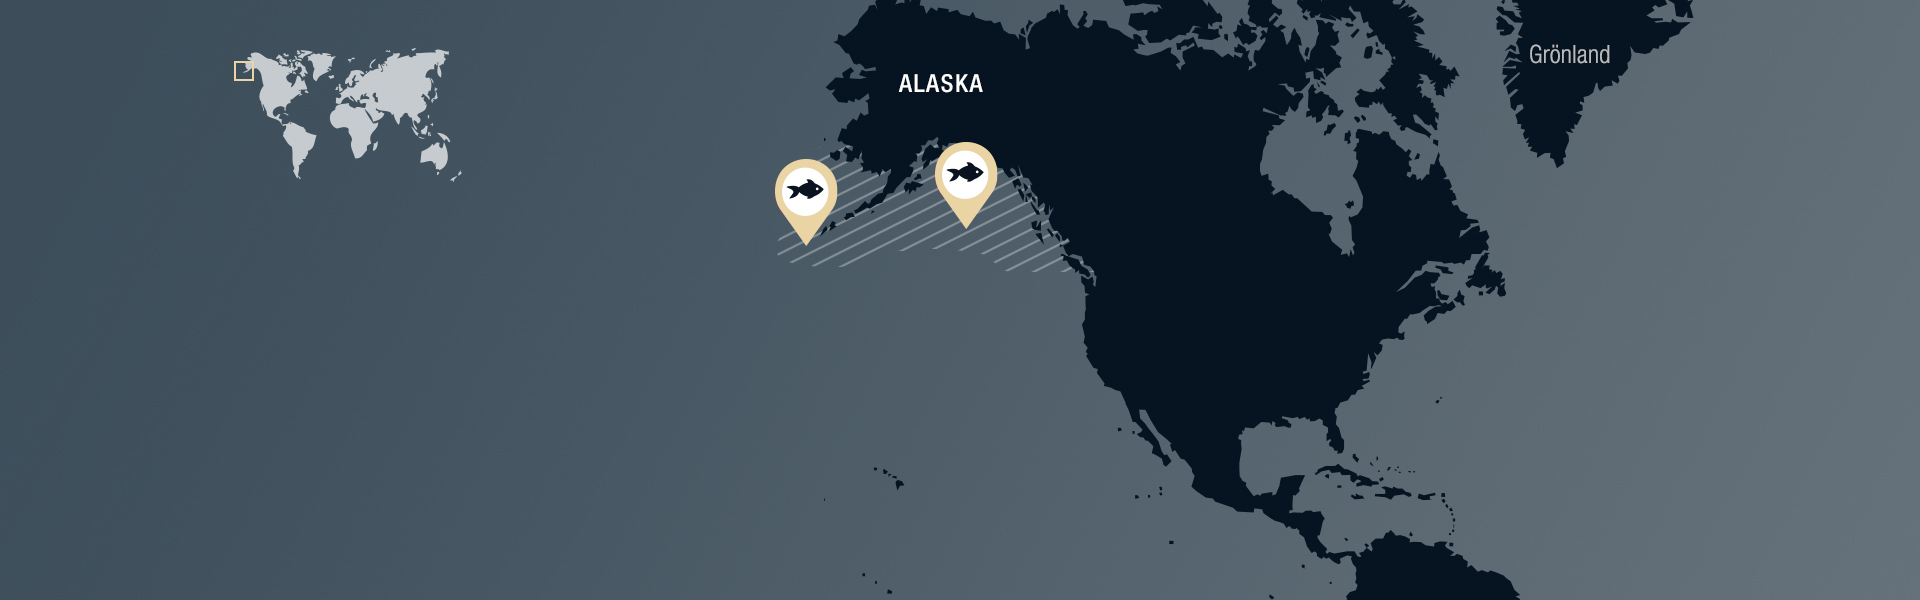 Nordostpazifik (Alaska, FAO 67) gefangen mit Kiemennetzen du vergleichbaren Netzen.